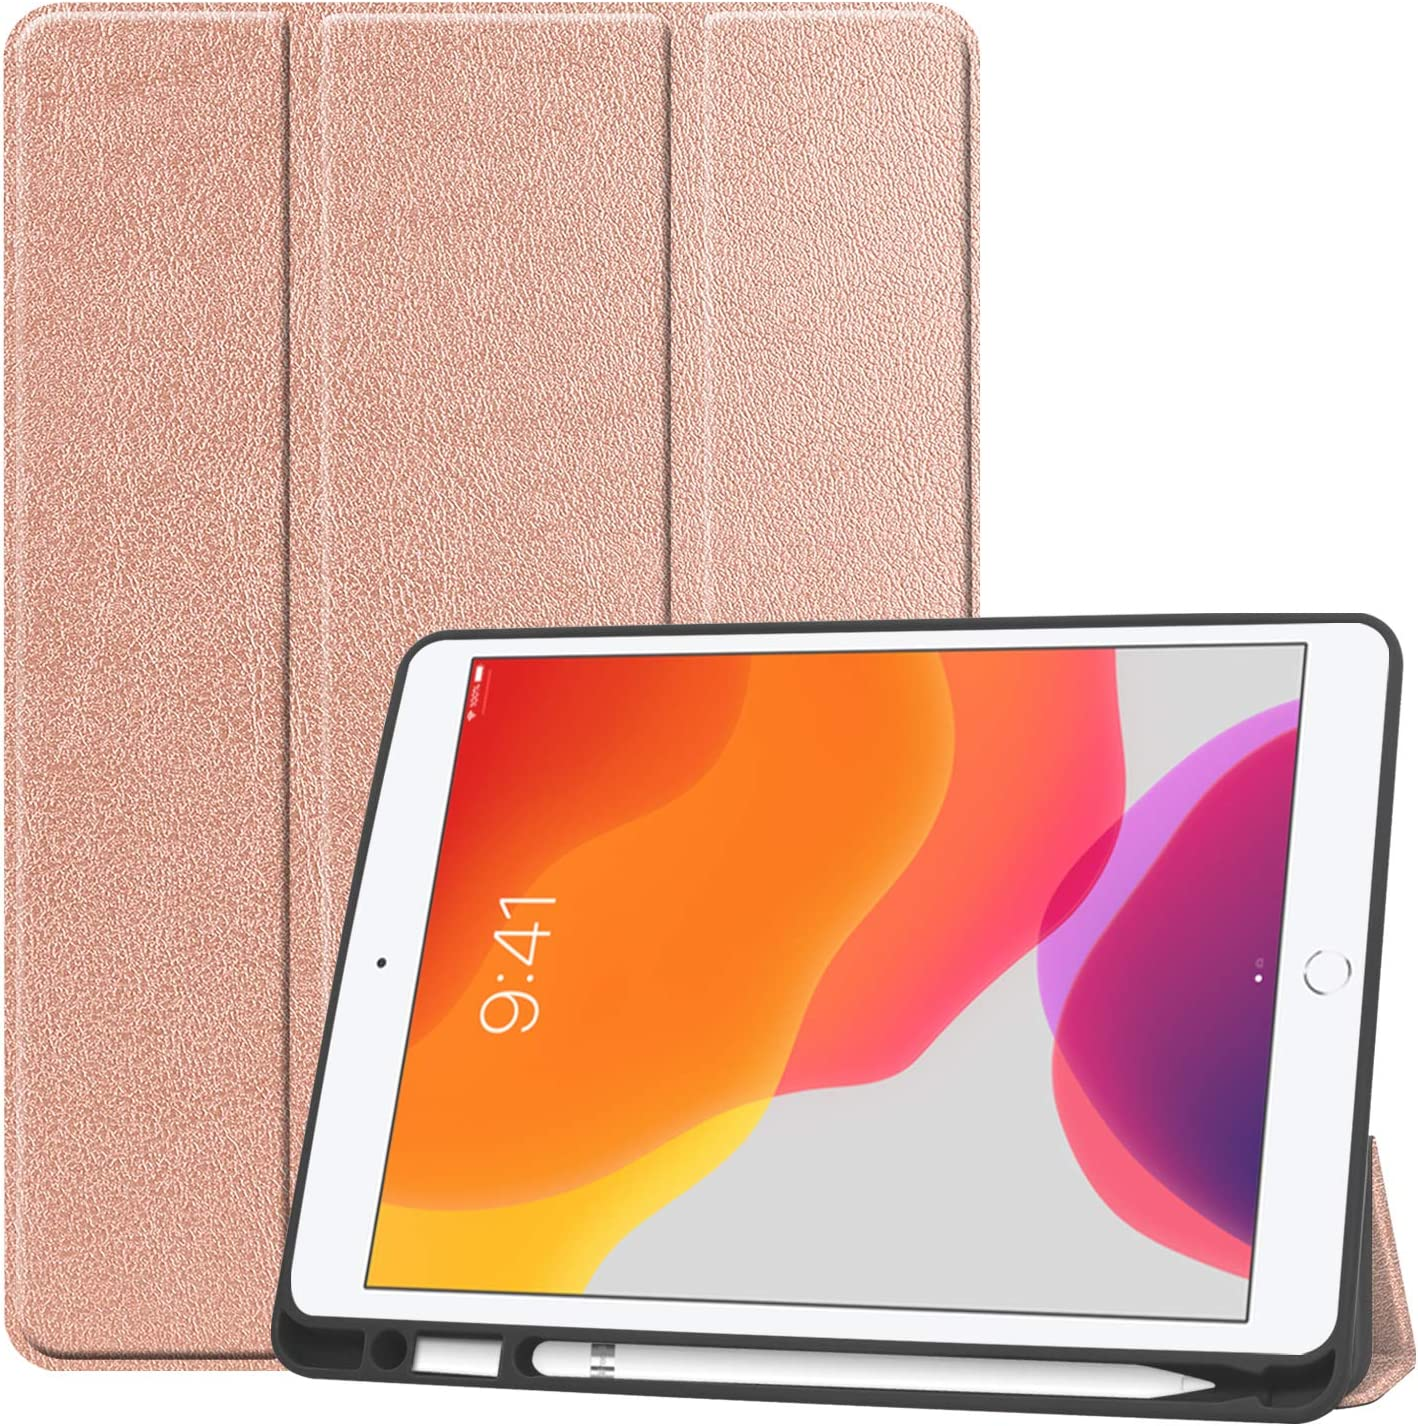 SZJCLTD iPad 10.2 Case & Pencil Holder- Slim Tri-Fold Case for iPad 8th Gen 2020/ iPad 7th Gen 2019 Apple Tablet, with Microfiber Inner Lightweight Smart Cover Auto Wake/Sleep (Rose Gold)